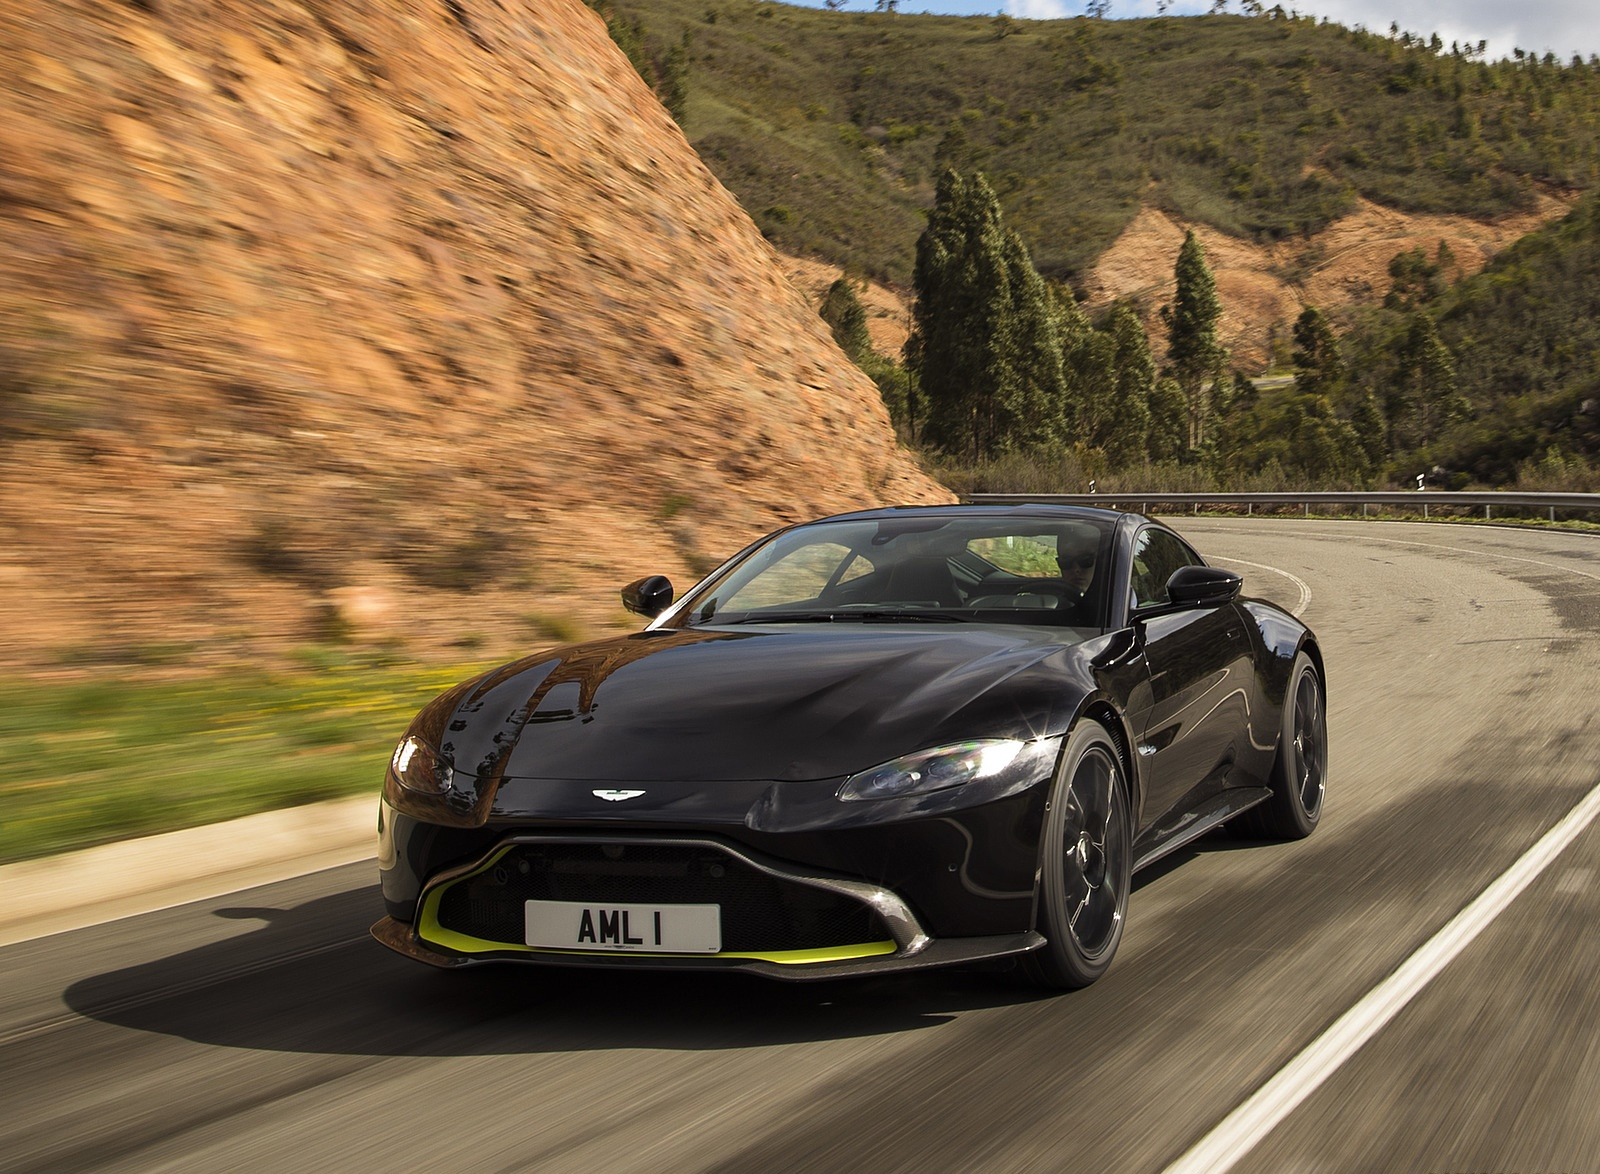 2019 Aston Martin Vantage (Onyx Black) Front Three-Quarter Wallpapers (5)